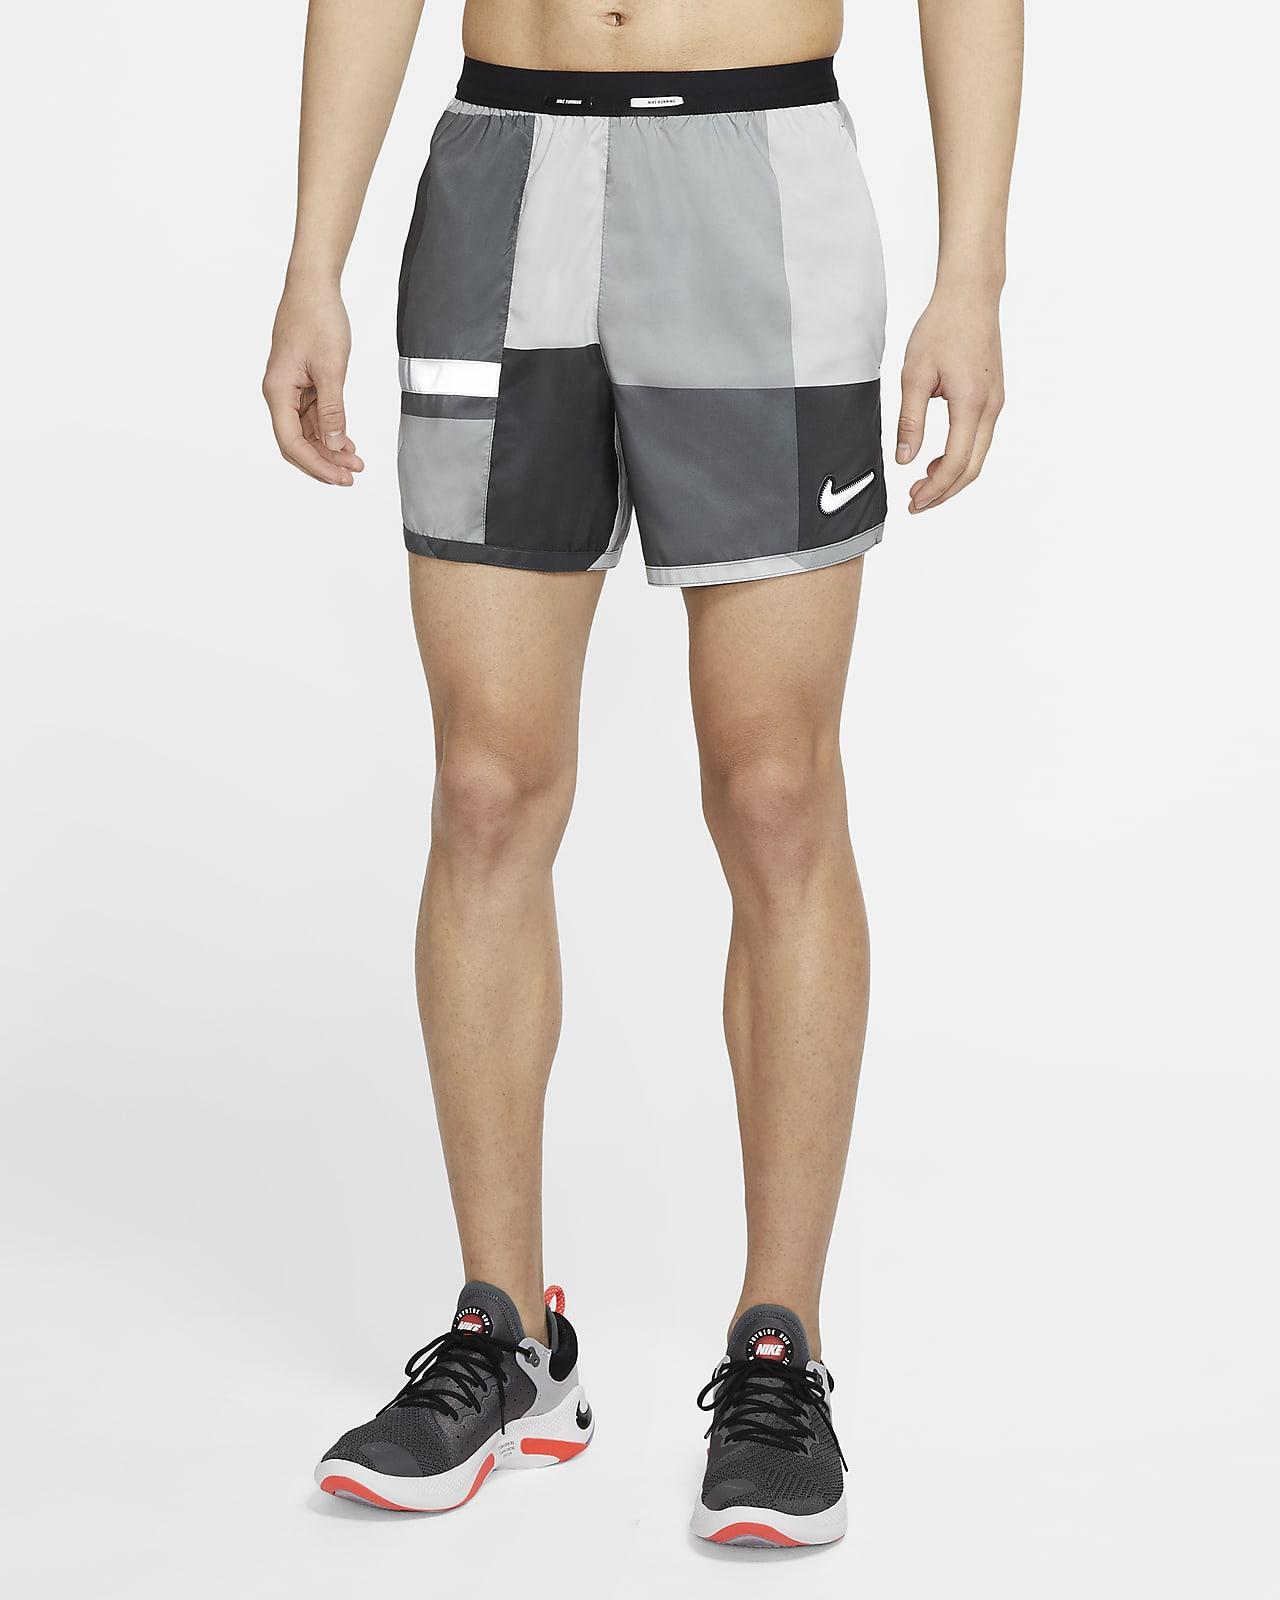 Nike Flex Stride Wild Run Men's 13cm (approx.) Running Shorts